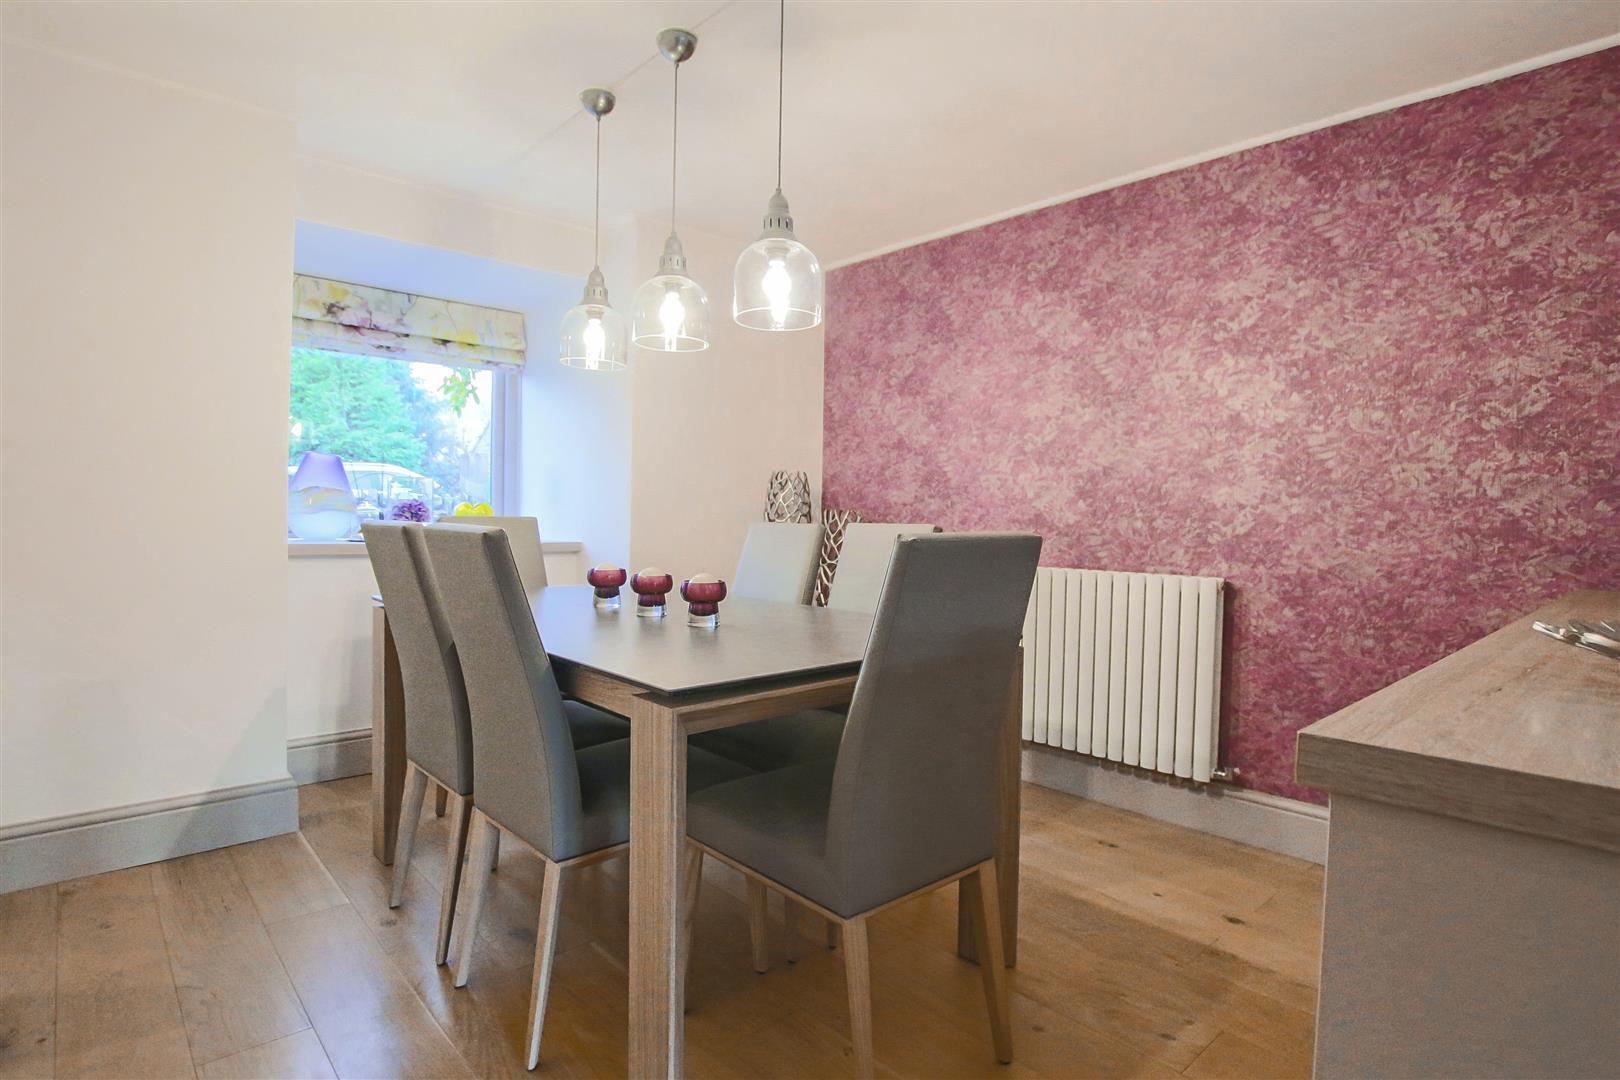 3 Bedroom Cottage For Sale - Dining Area